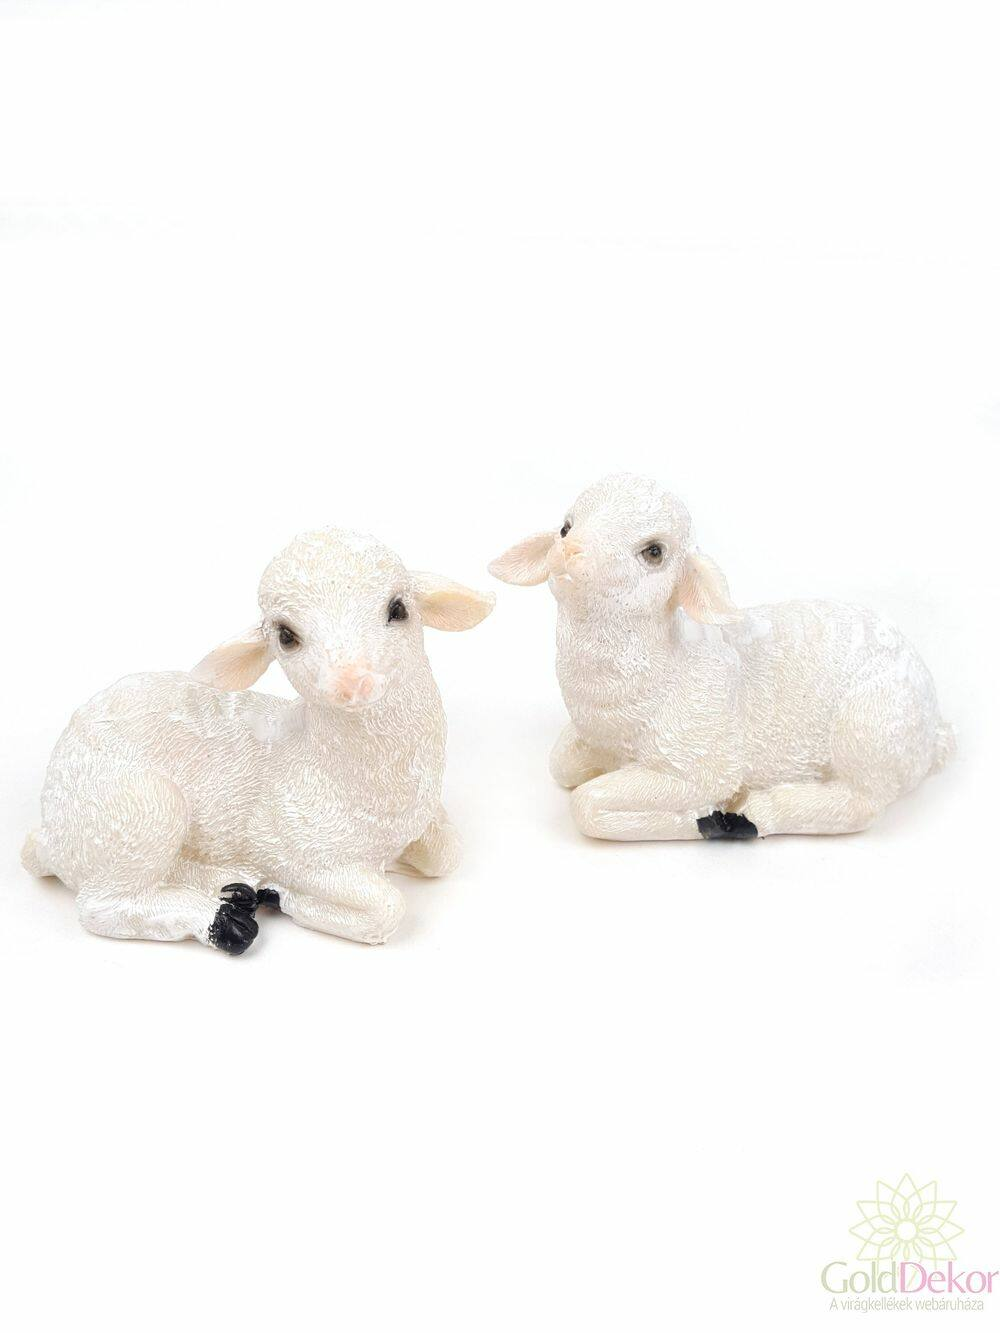 Fekvő bárány figura